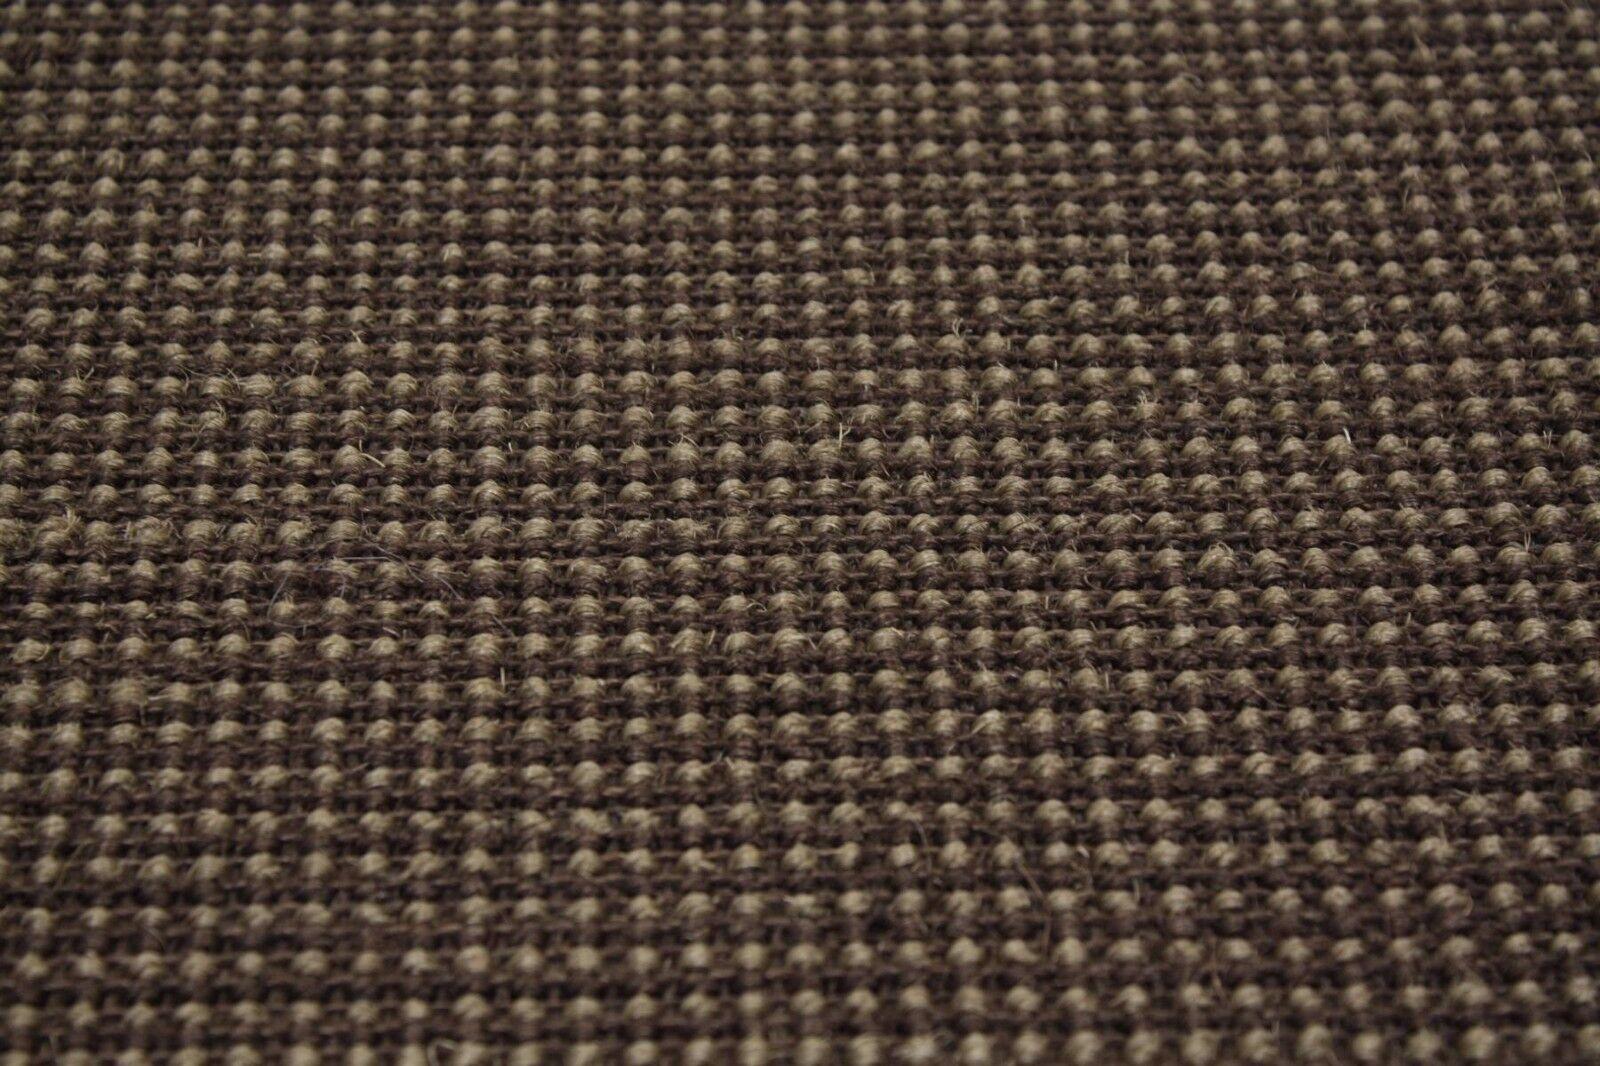 Sisal alfombra umkettelt café estampadas café umkettelt 200x300cm 100% sisal Braun gekettelt 27bb79